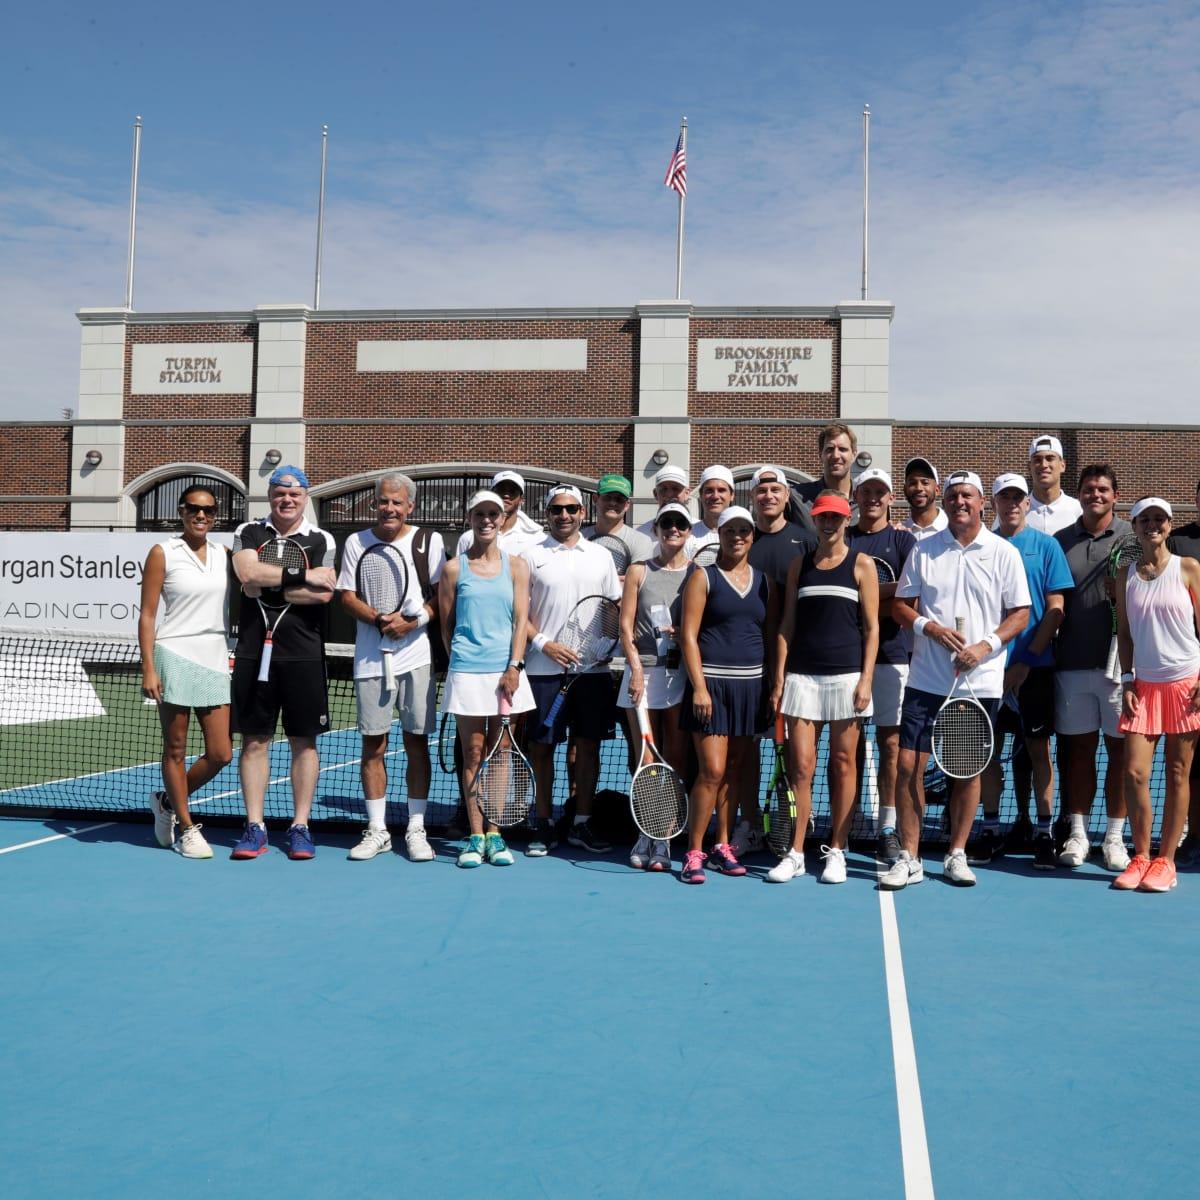 Dirk Nowitzki tennis tournament